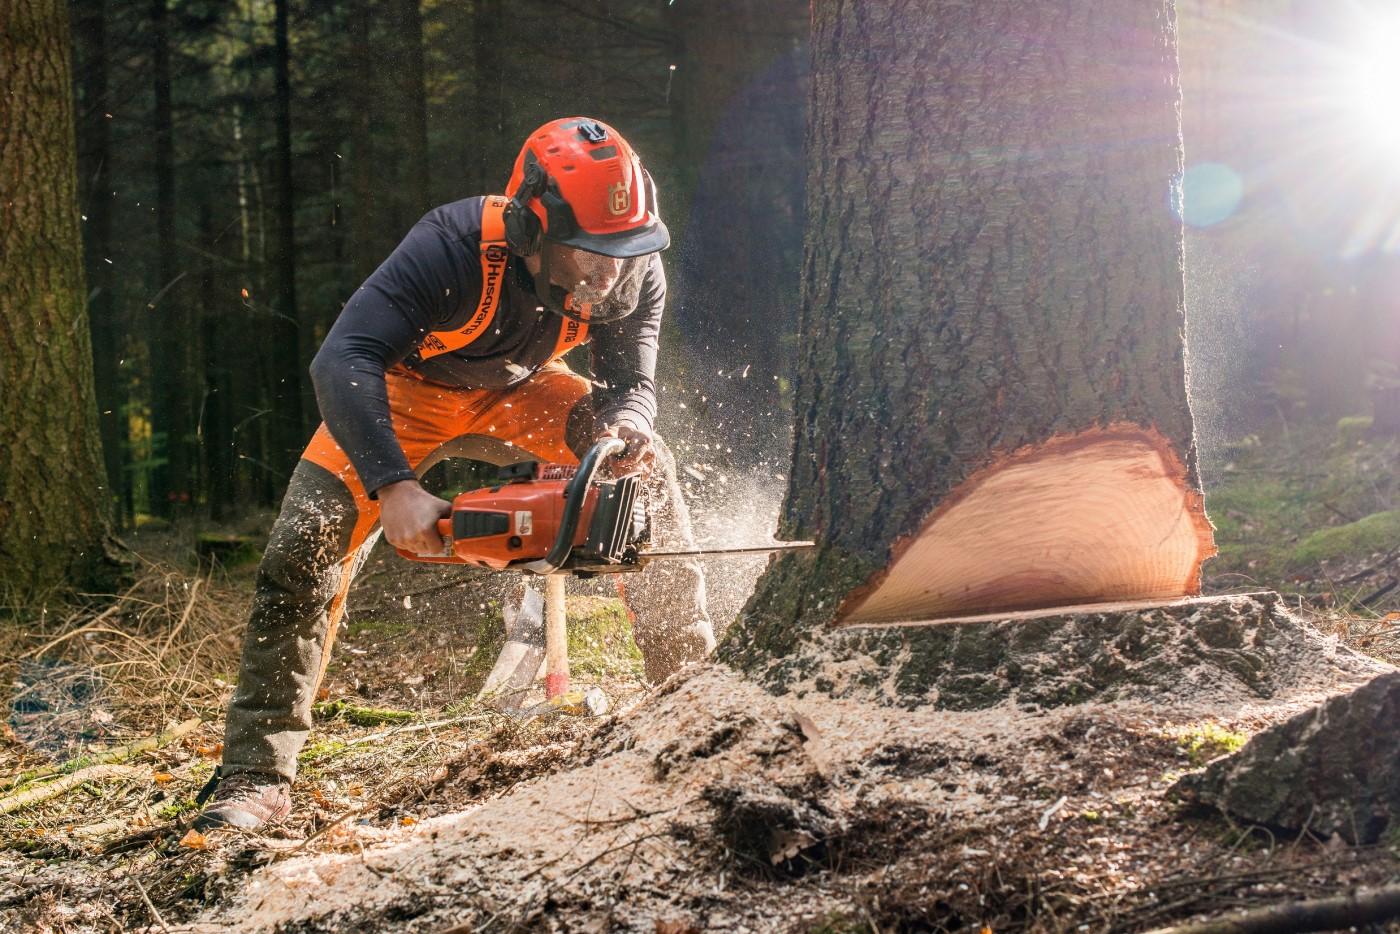 Fotos de Die Holzfäller GbR